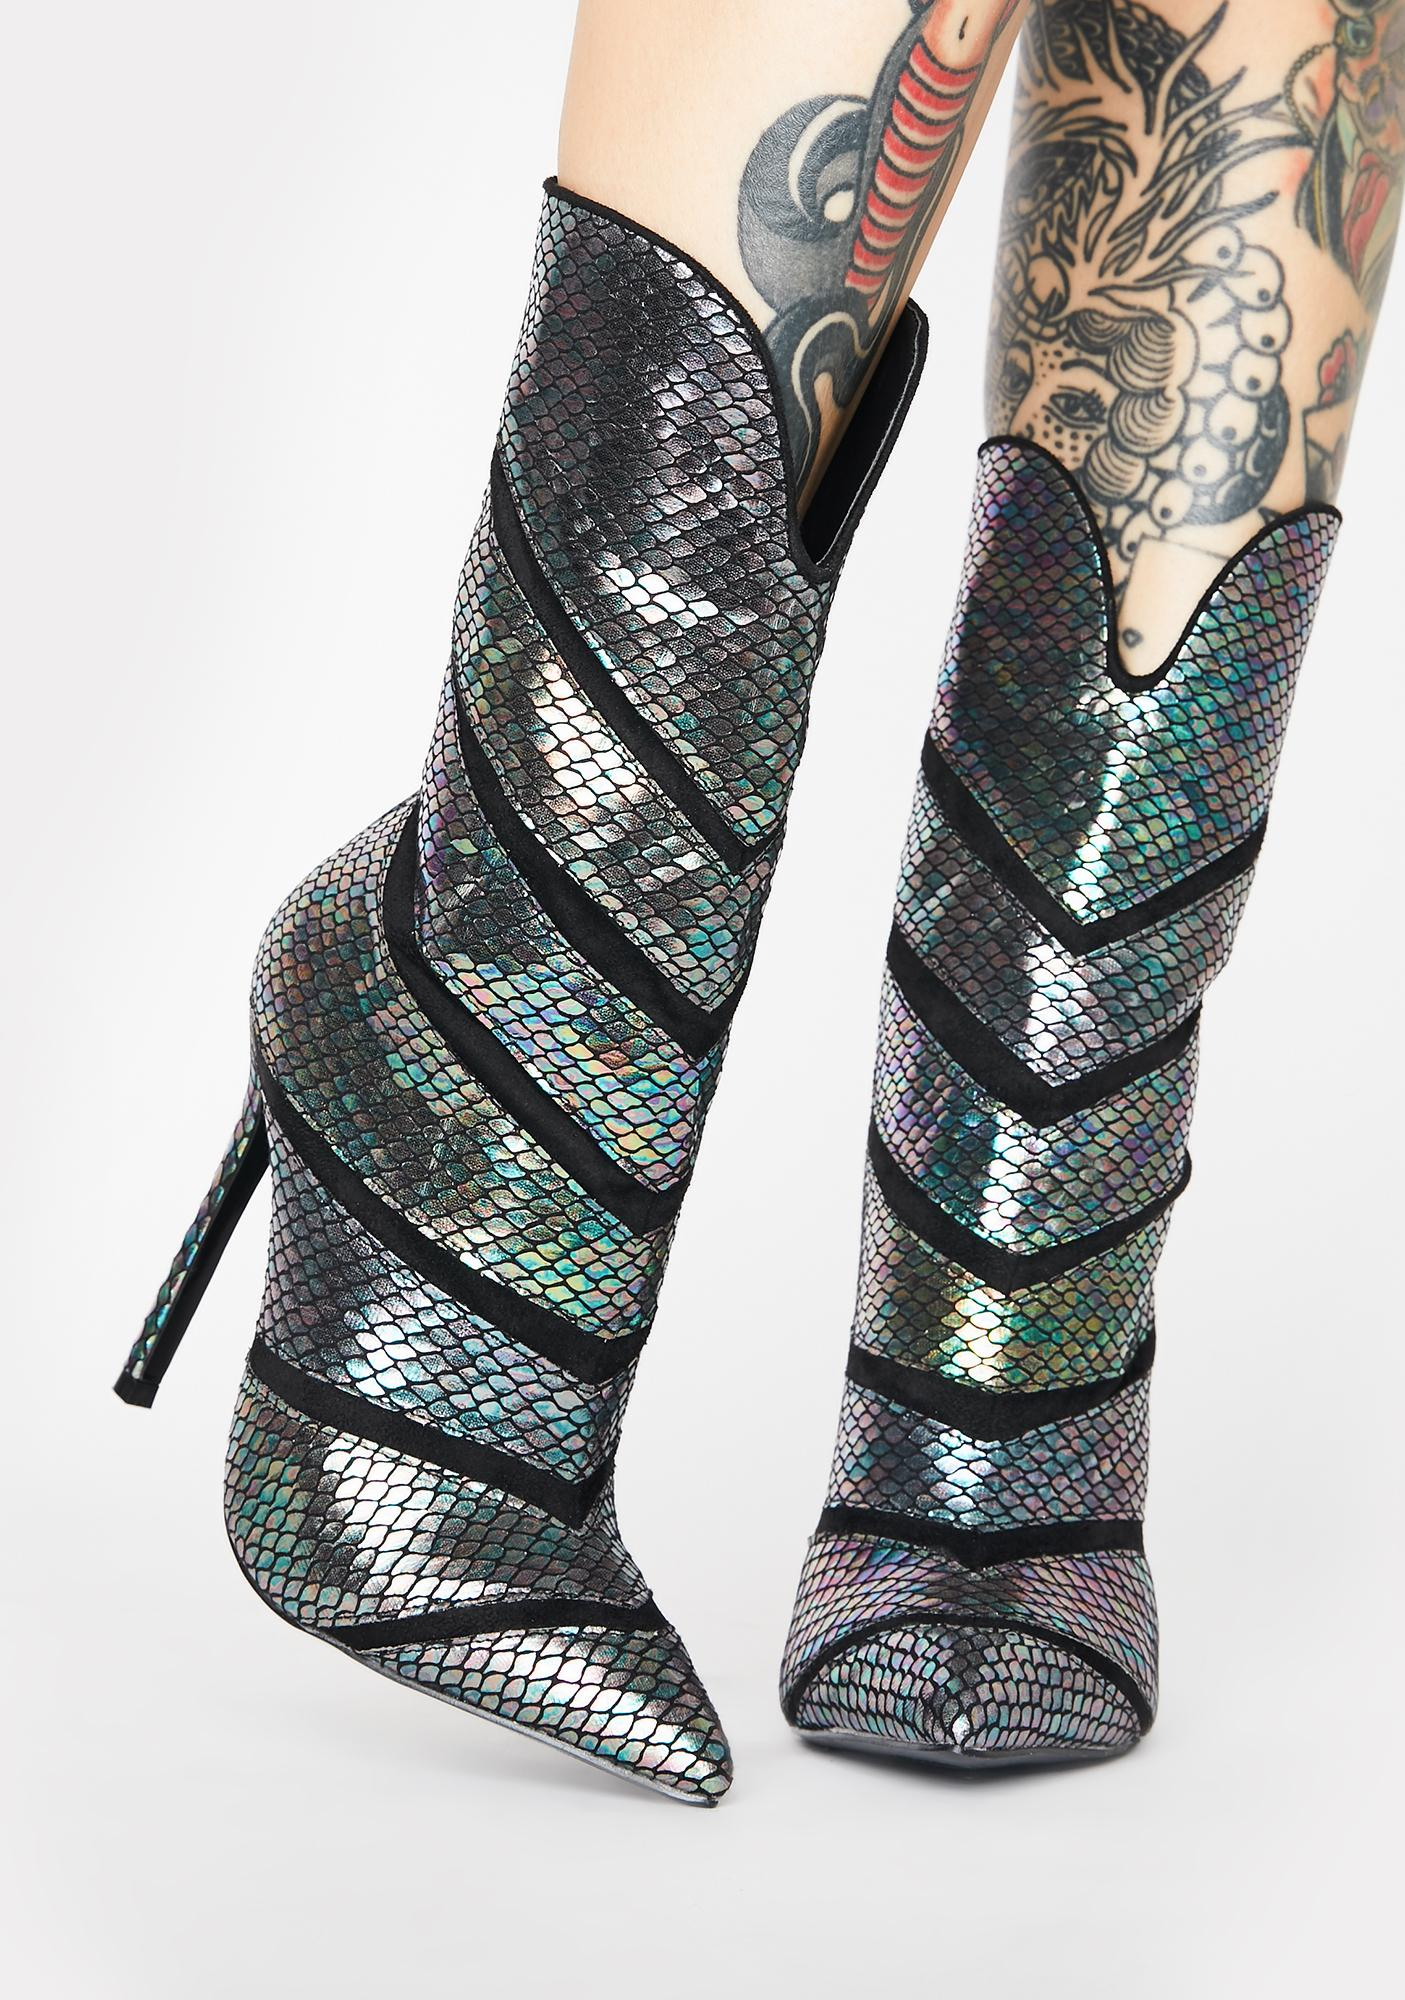 Lemon Drop by Privileged Plushin Metallic Snakeskin Boots